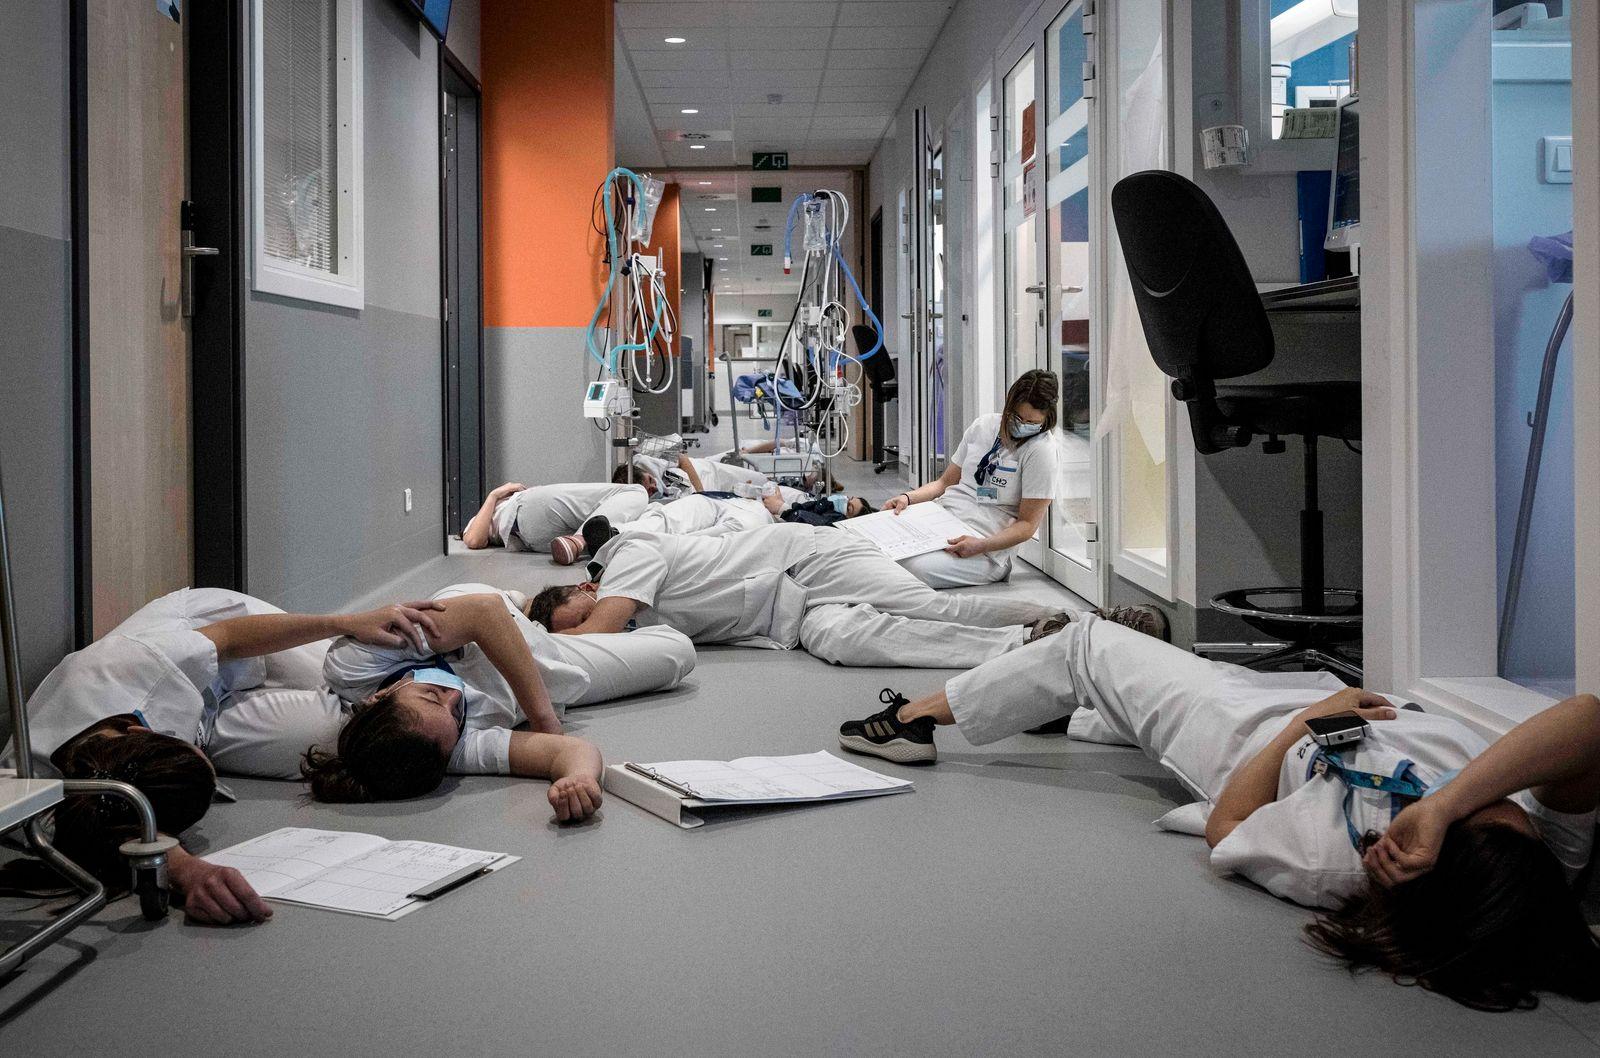 BELGIUM - INTERNATIONAL NURSE DAY ACTION AT MONT LEGIA HOSPITAL